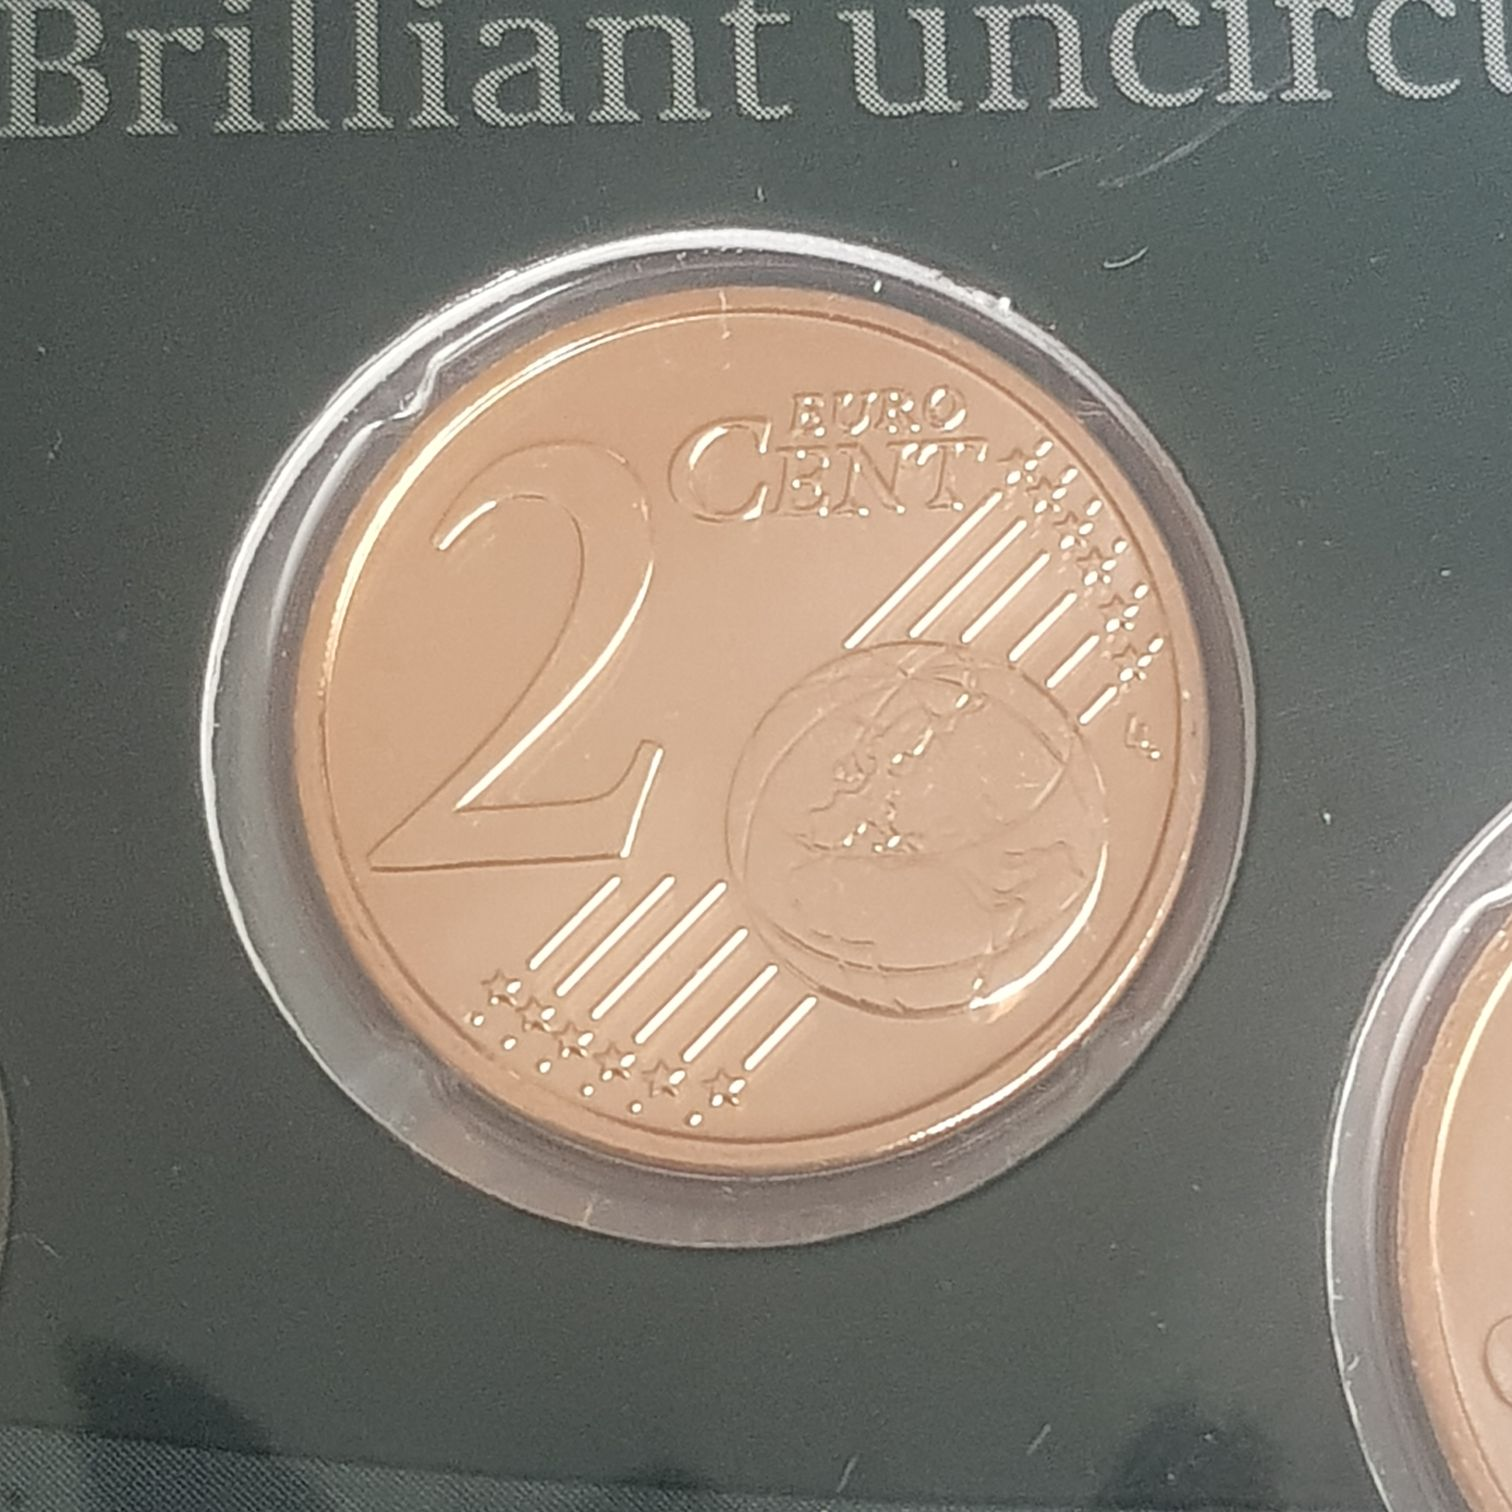 .02 Centavos De Euro Coin - $.02 (2017) front image (front cover)